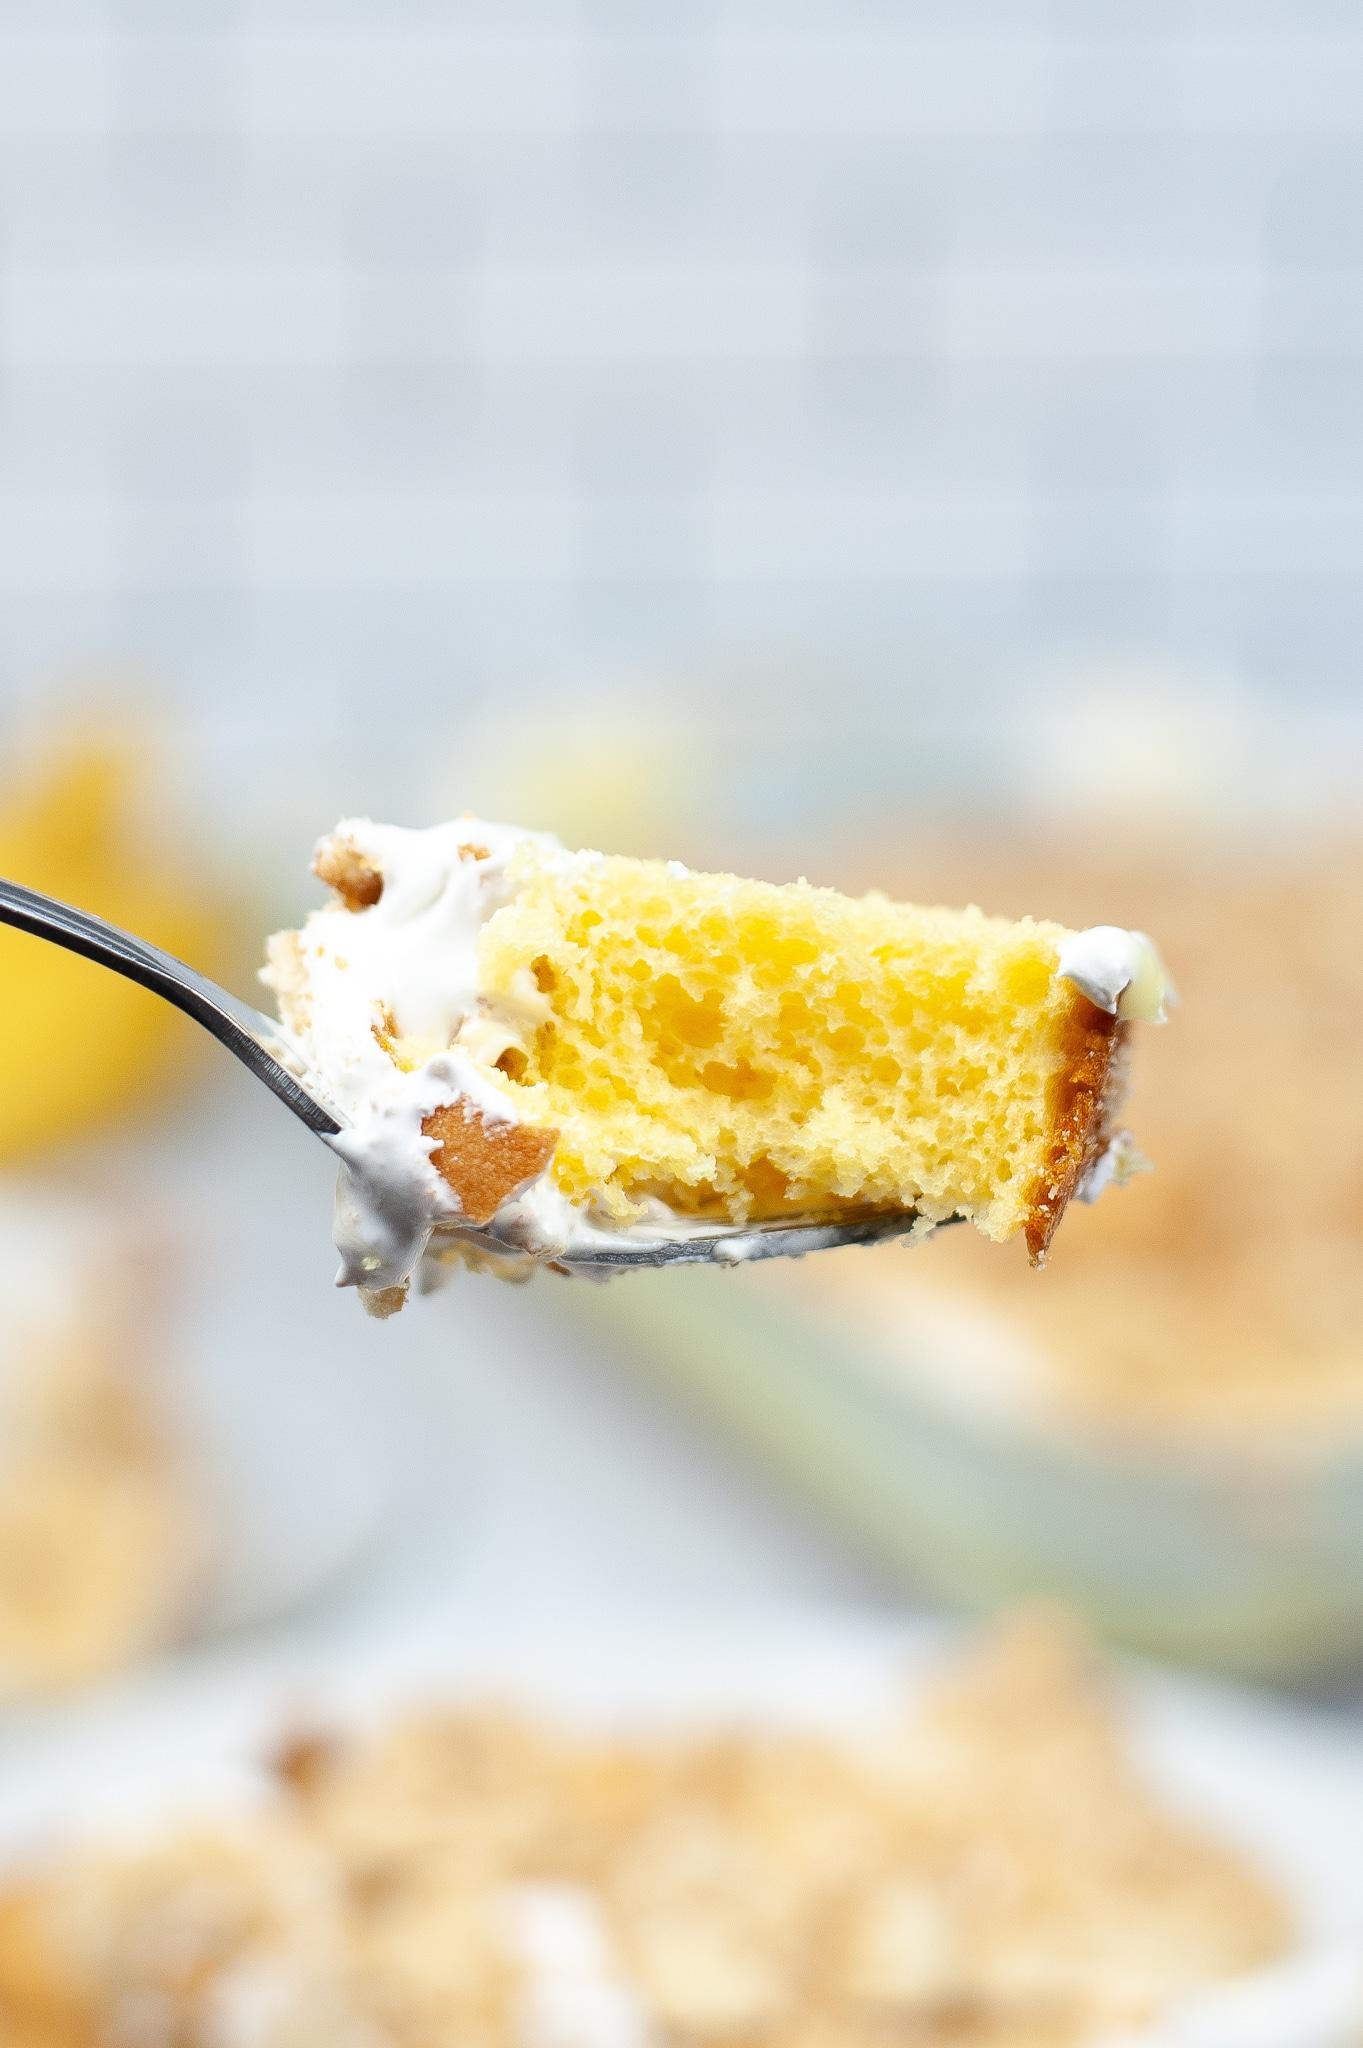 forkful of banana poke cake